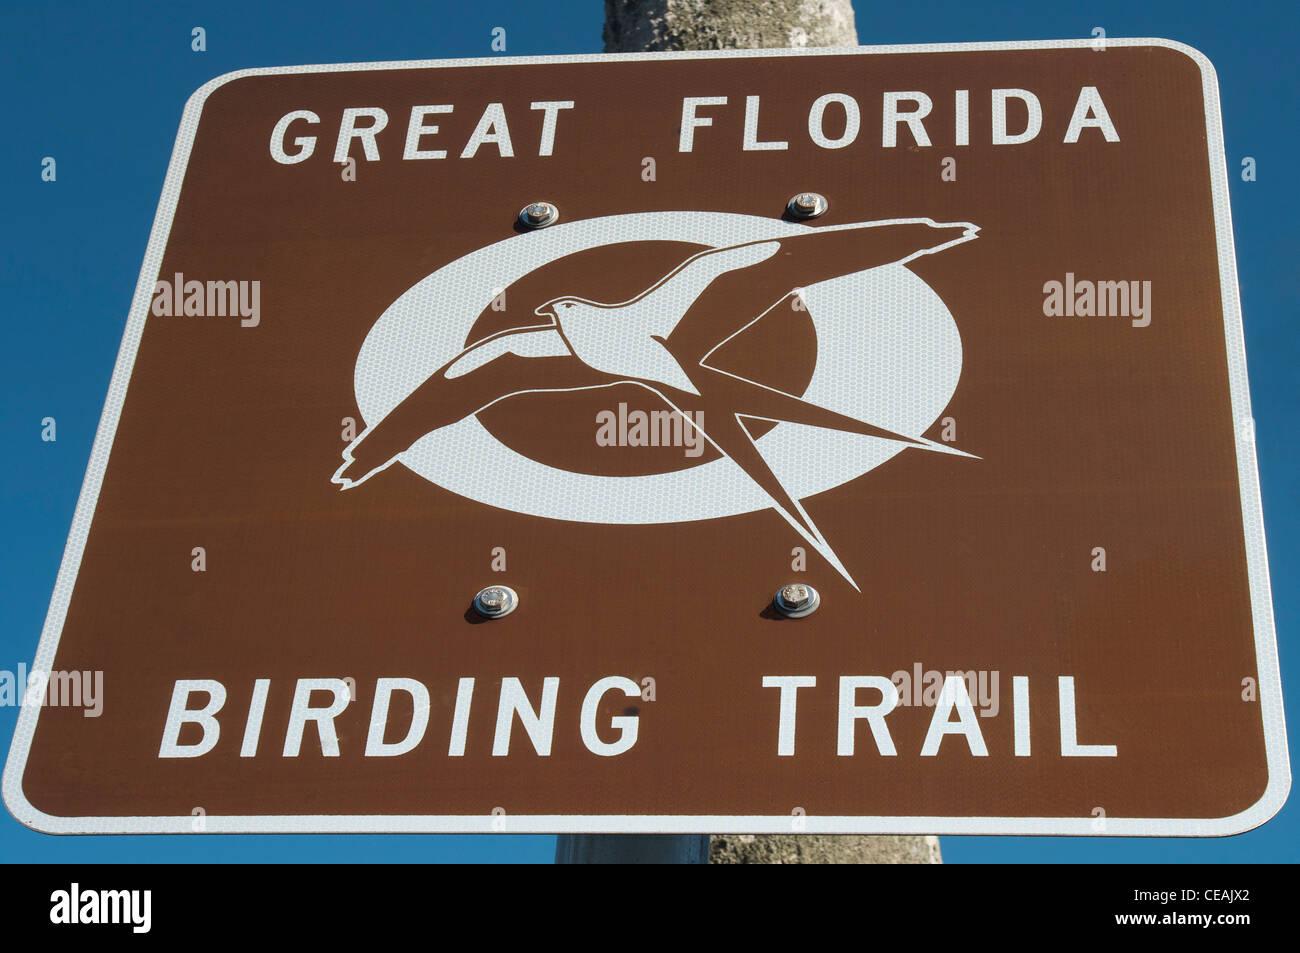 Great Florida Birding Trail sign, Cedar Key, Florida, United States, USA - Stock Image